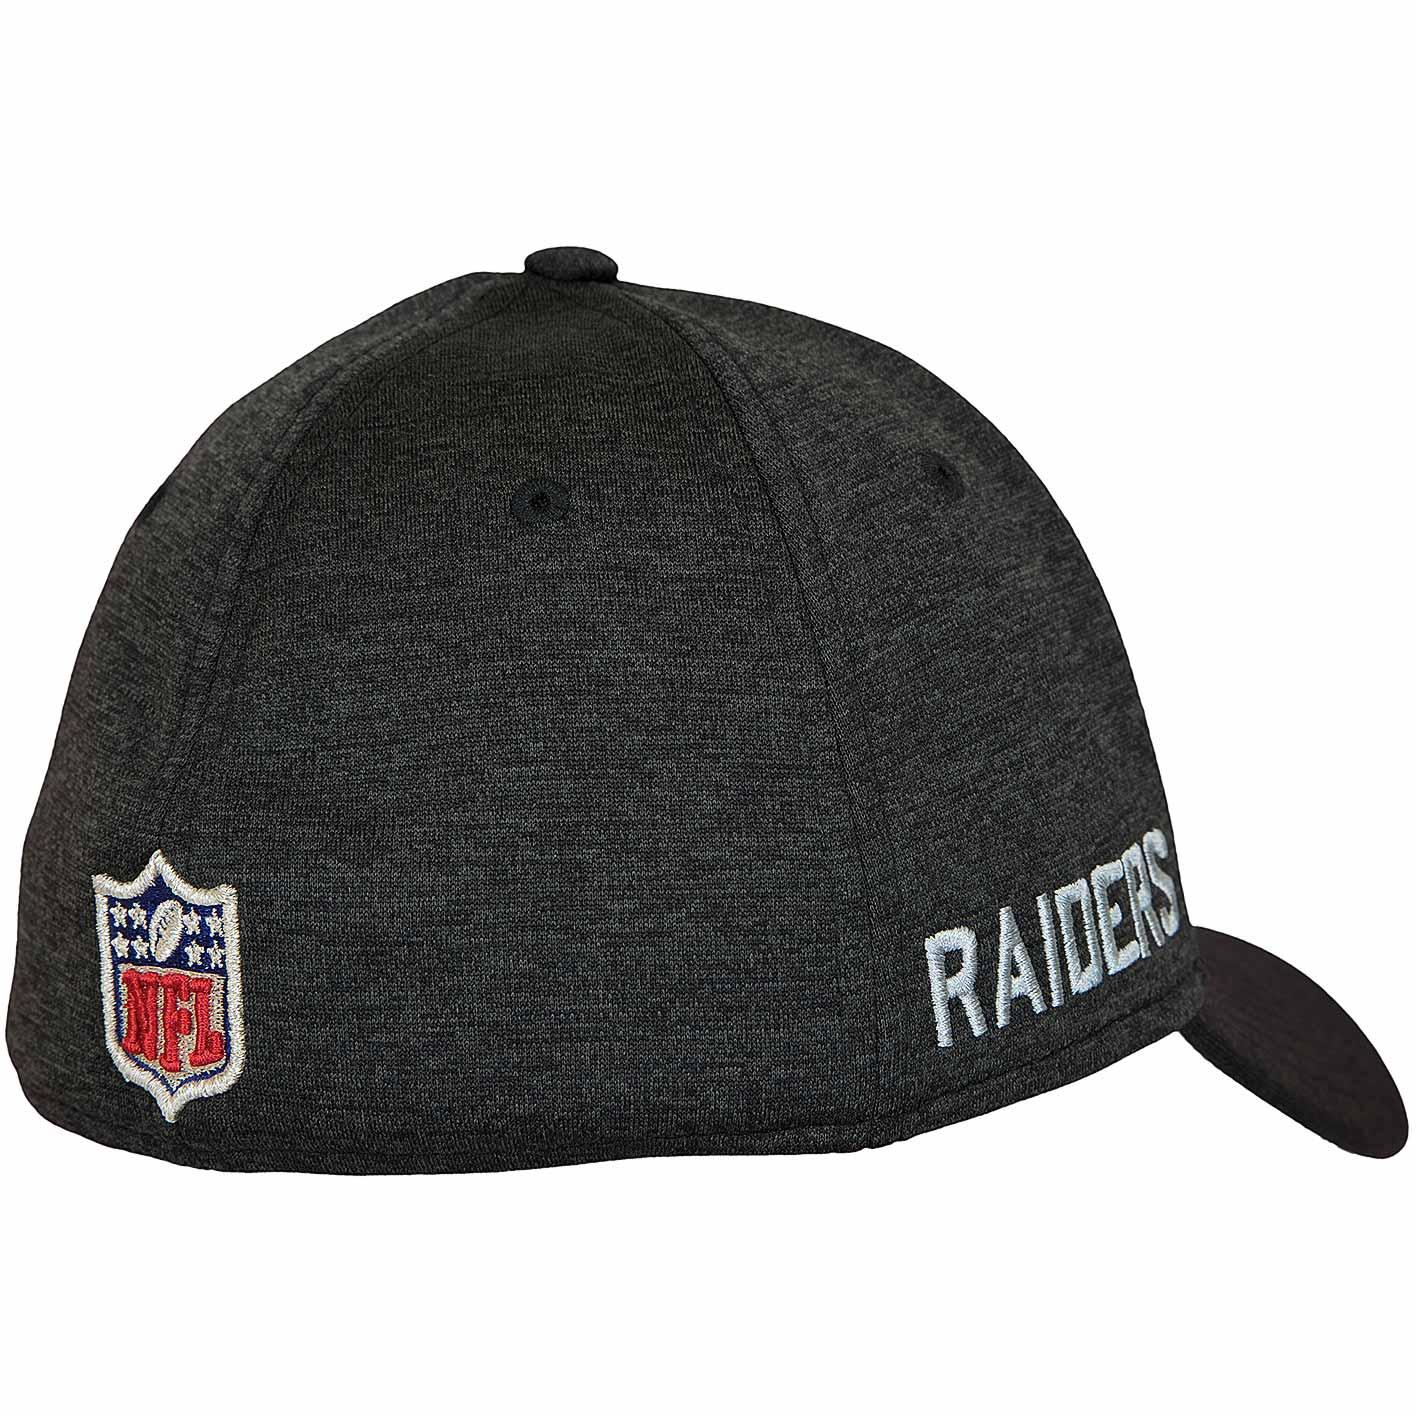 7a9b2a9d5da ... where to buy new era 39thirty flexfit cap onfield road oakland raiders  schwarz grau 16f16 b24a2